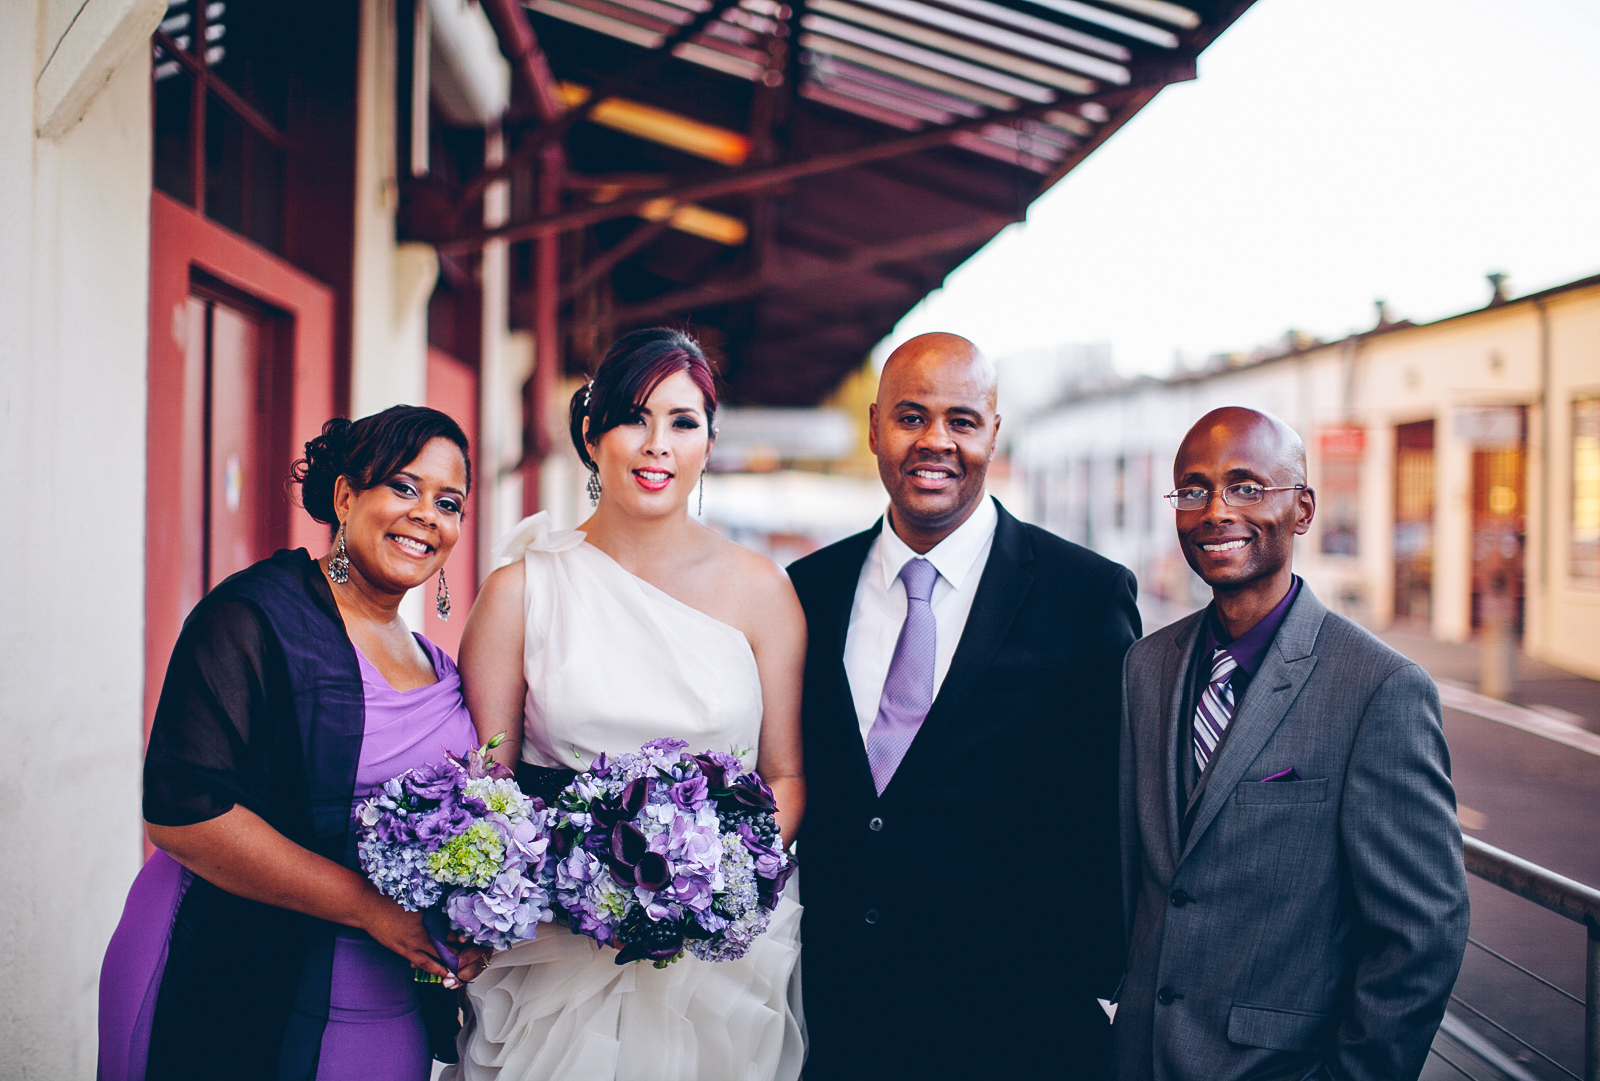 greens_restaurant_wedding_photography_san_franscisco_ebony_siovhan_bokeh_photography_62.jpg